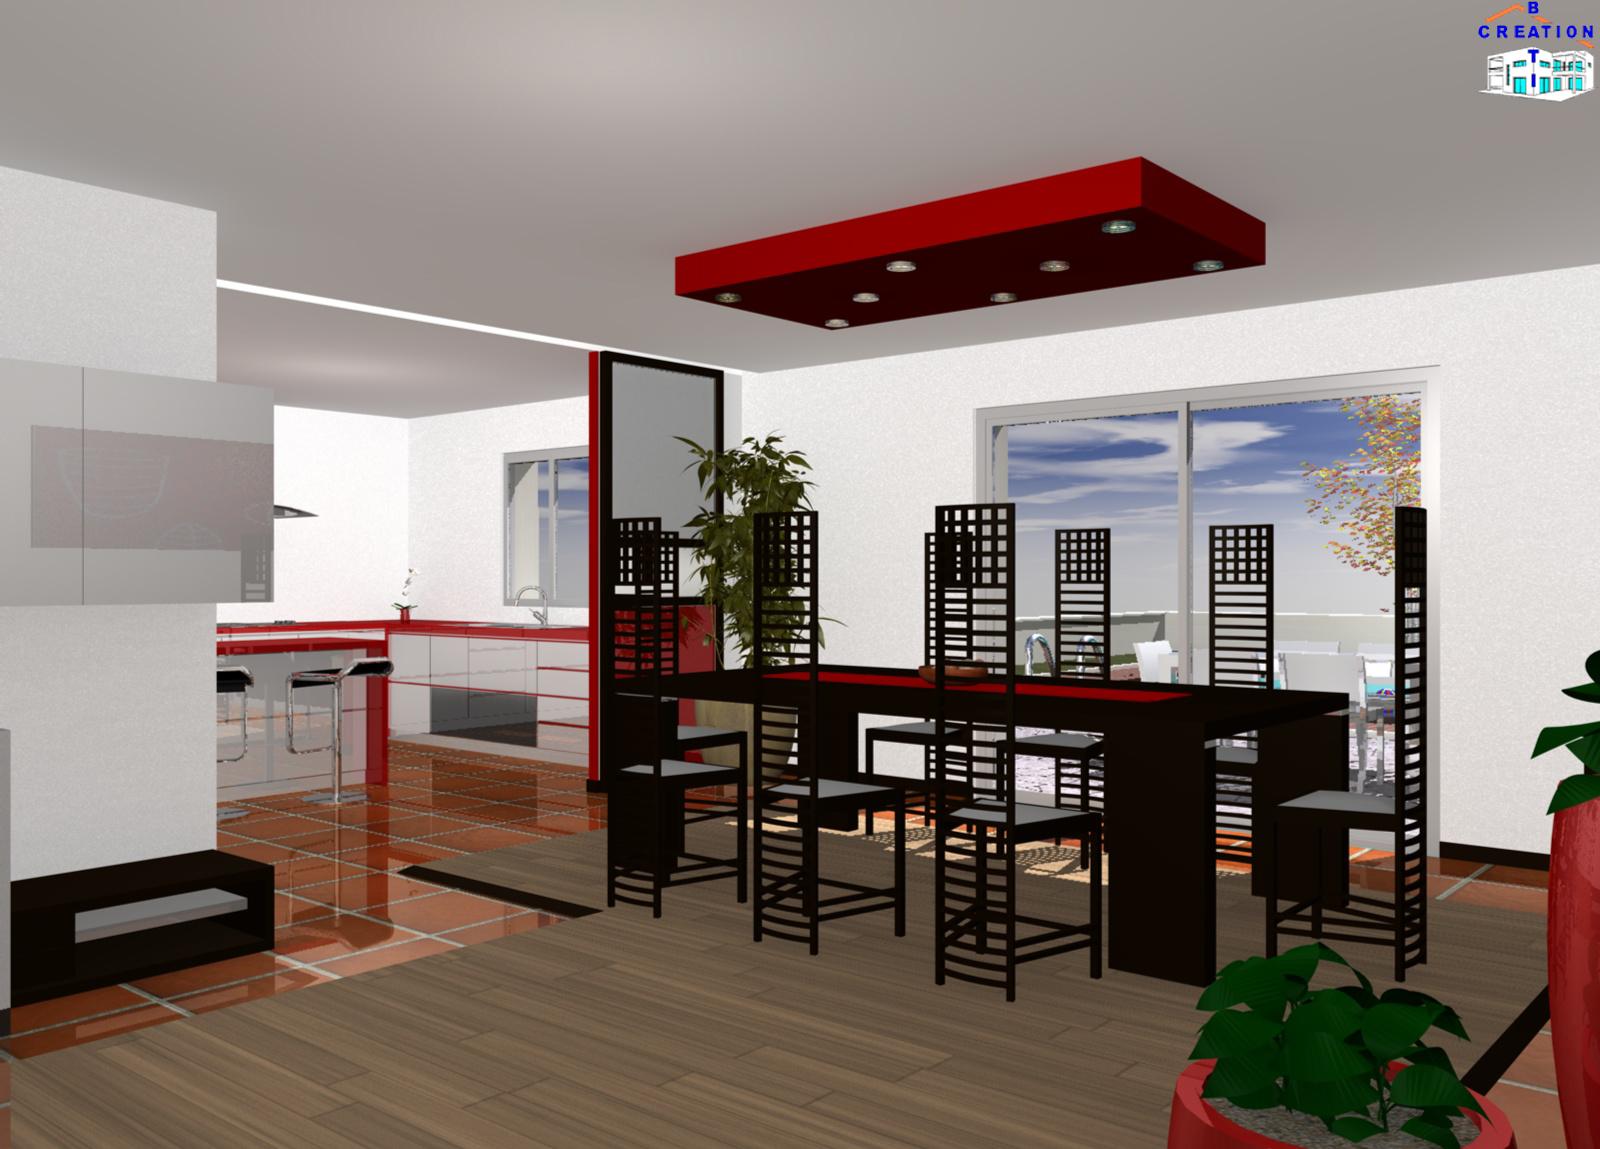 votre avis nous interesse 10 messages. Black Bedroom Furniture Sets. Home Design Ideas